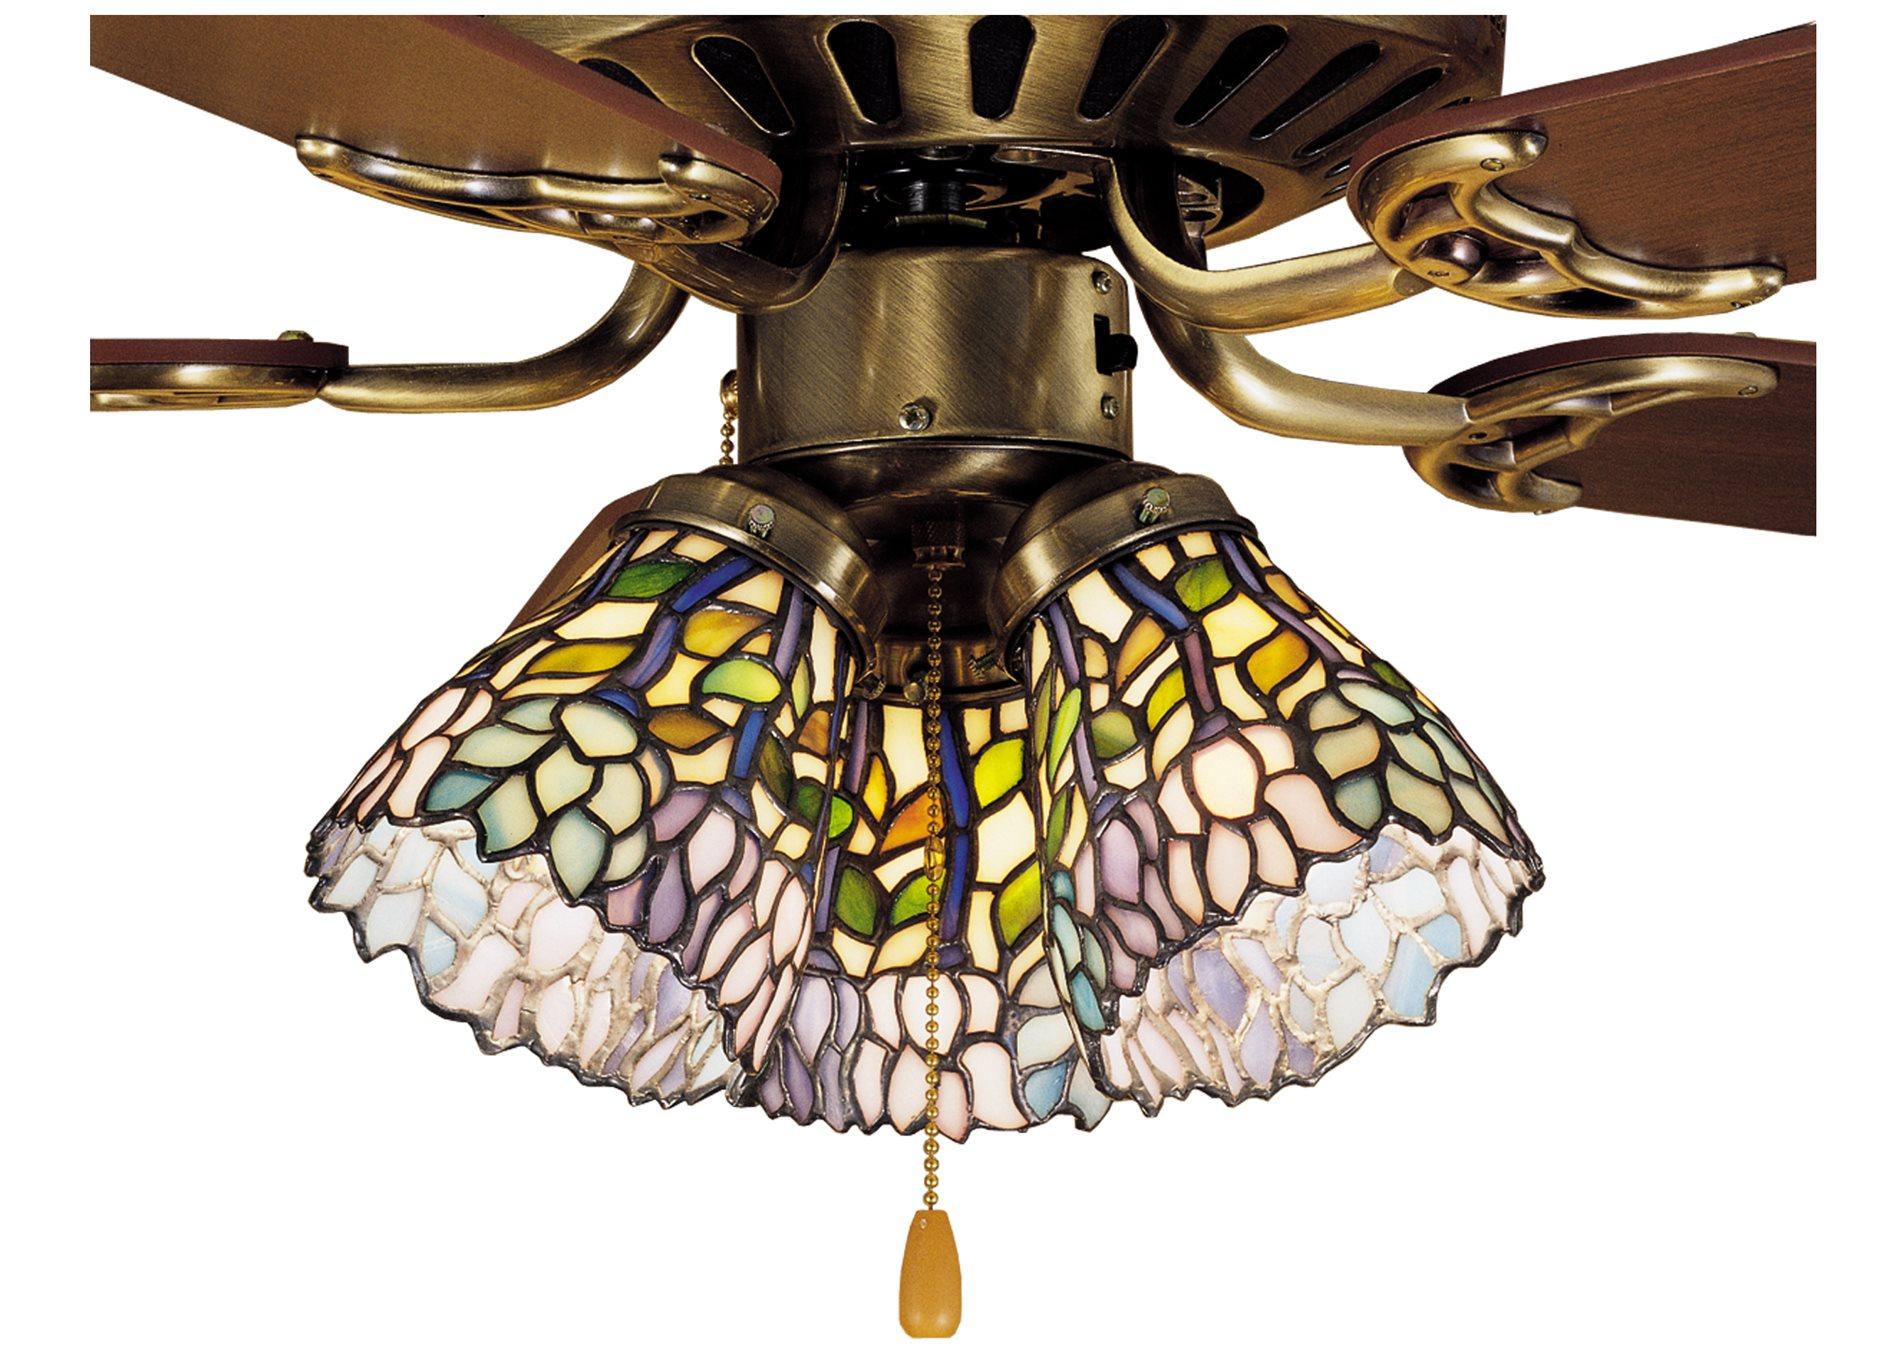 Meyda Tiffany Wisteria Fan Light Shade